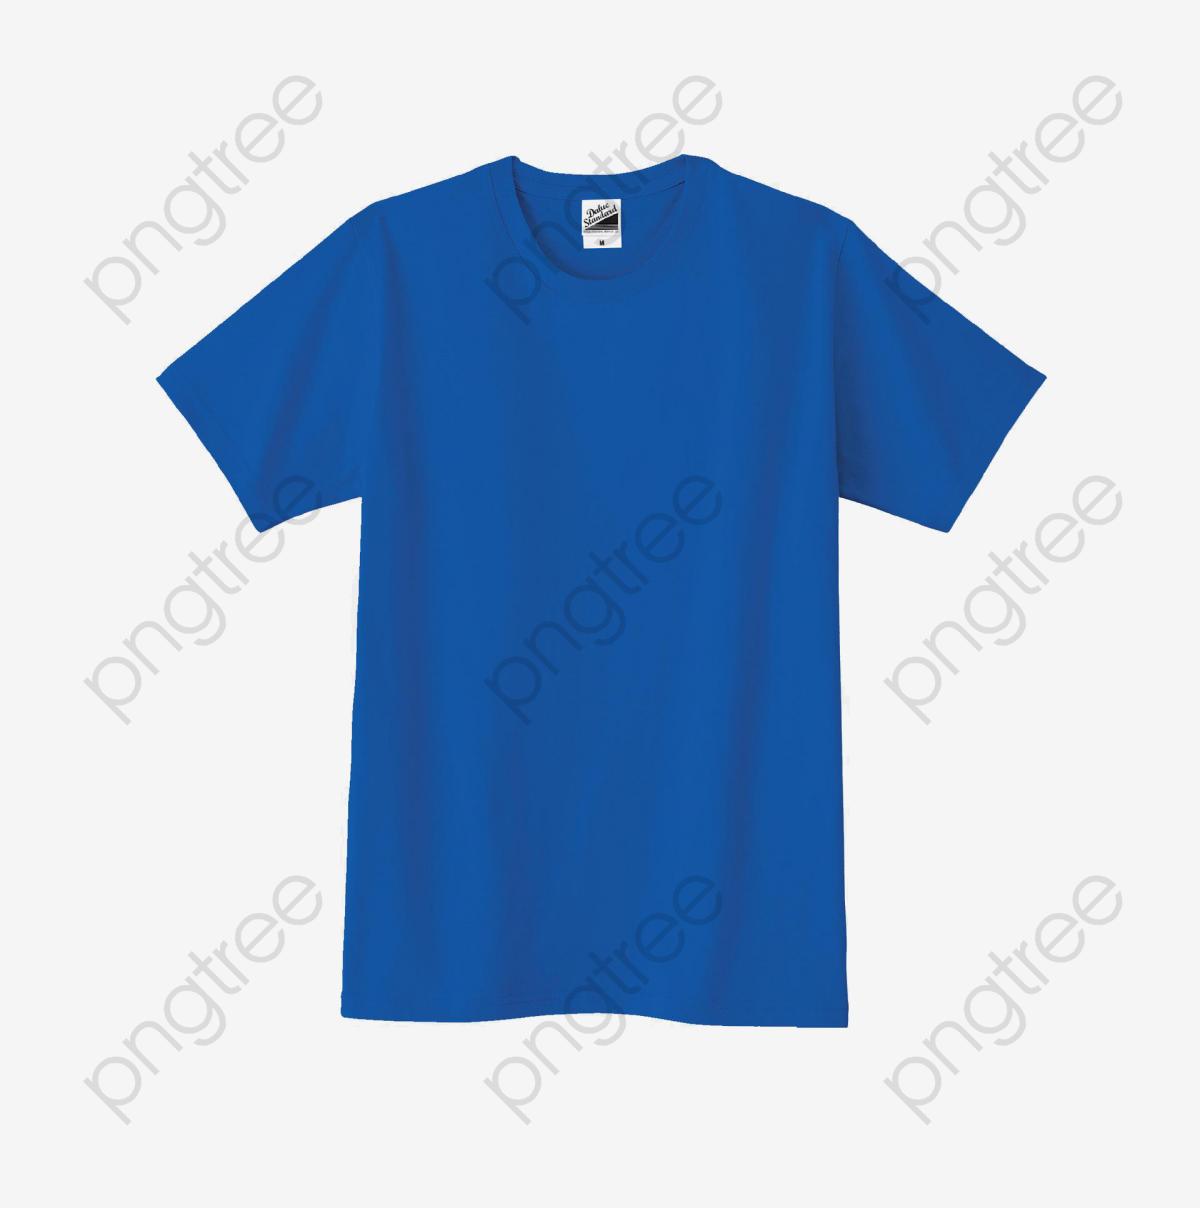 Blue T Shirt, Solid T Shirt, T Shirt, Clothing PNG Transparent Image.